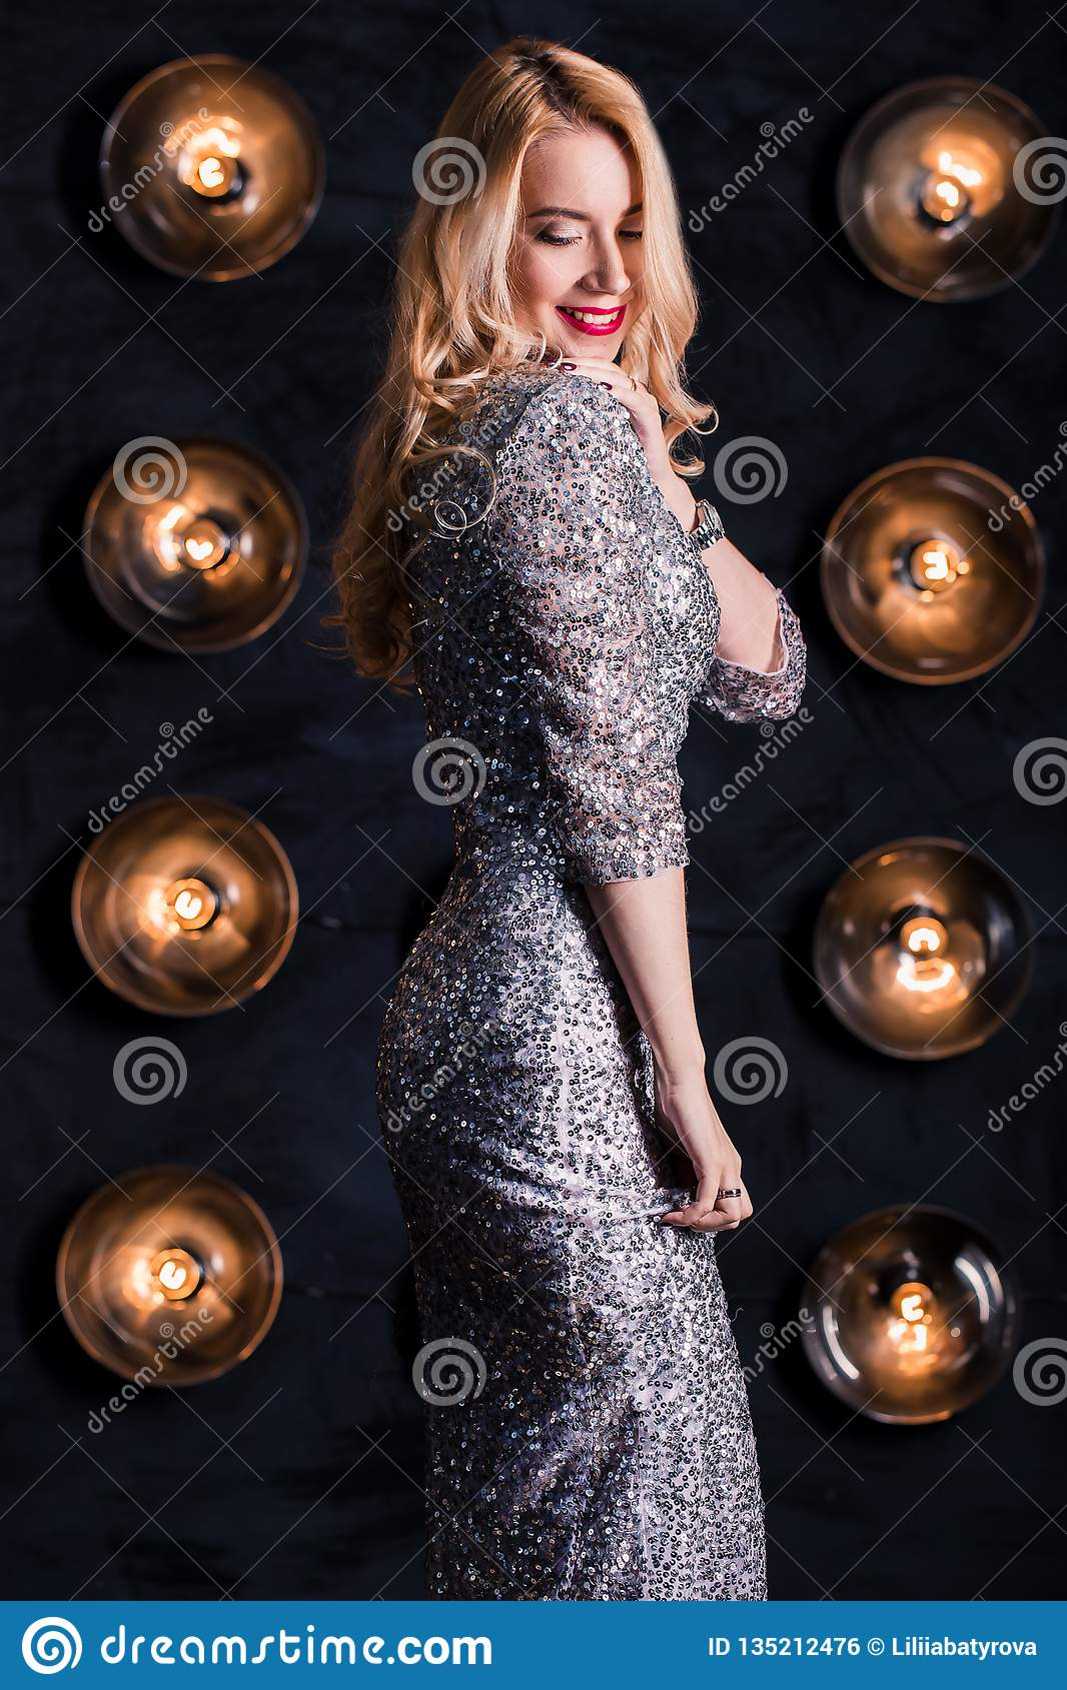 Happy joyful blond woman in a long silver dress on a black background. Celebration, party, new year